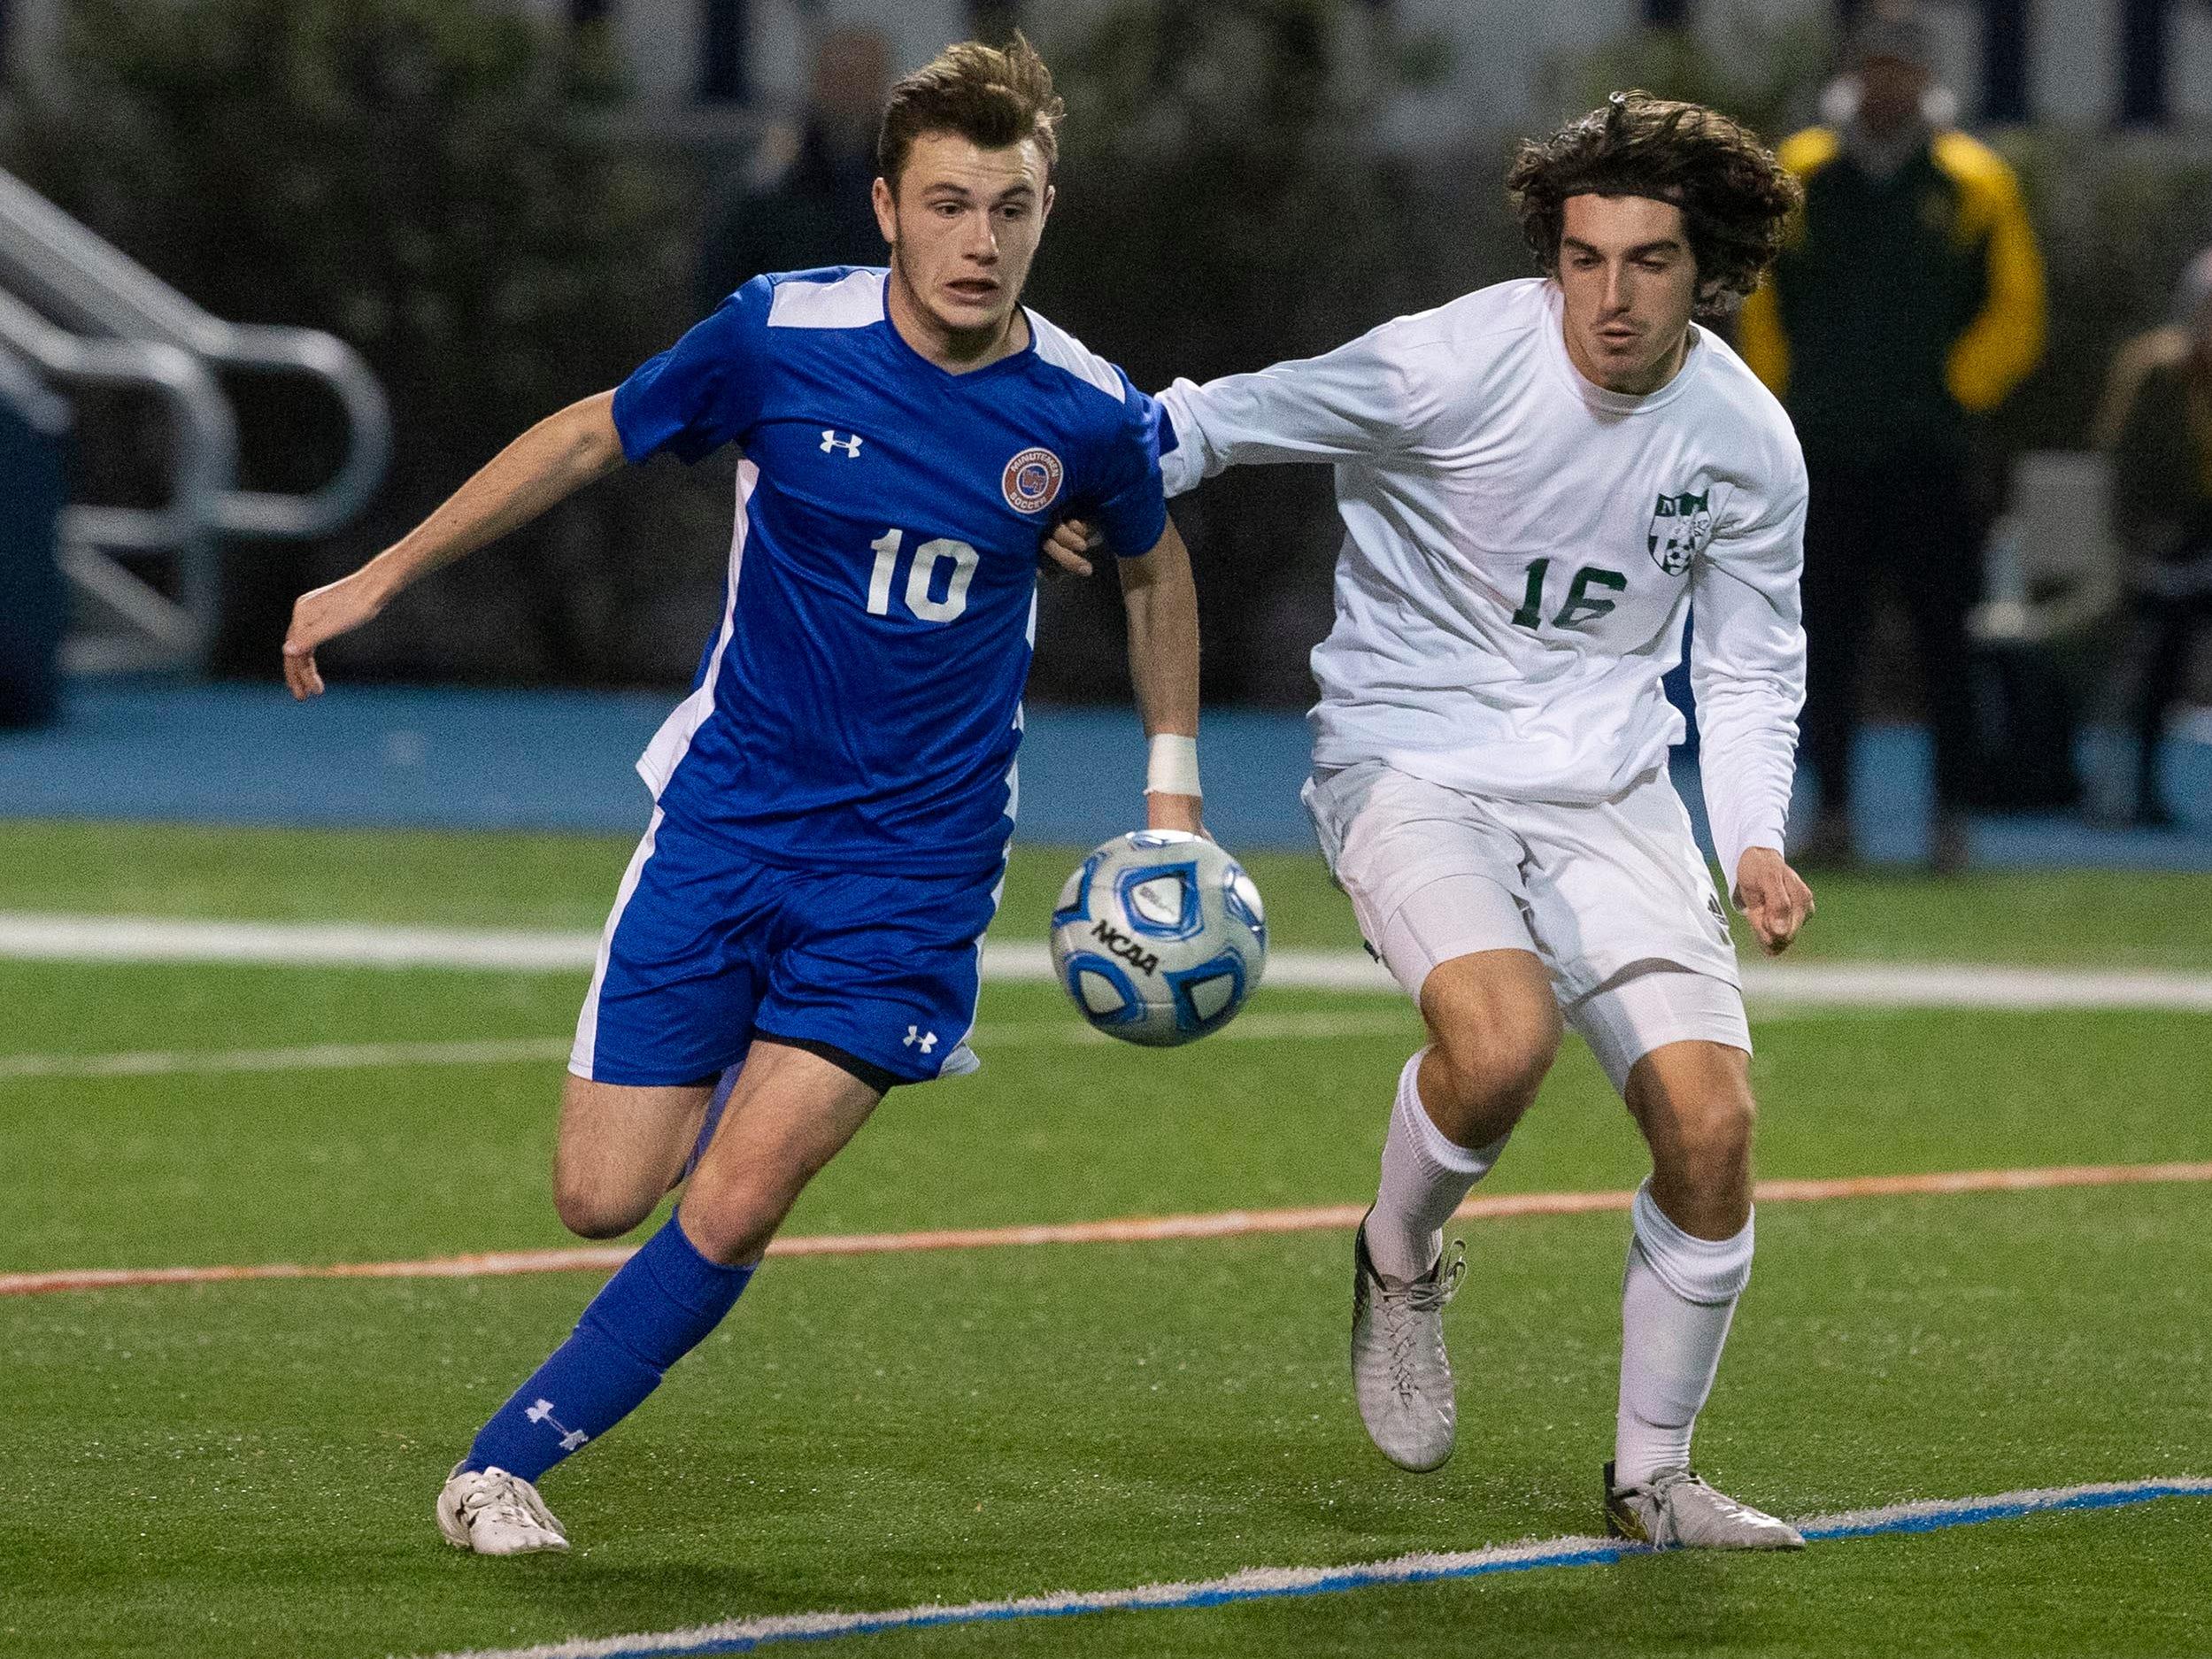 Morris Knolls boys soccer falls to Washington Township in Group IV final